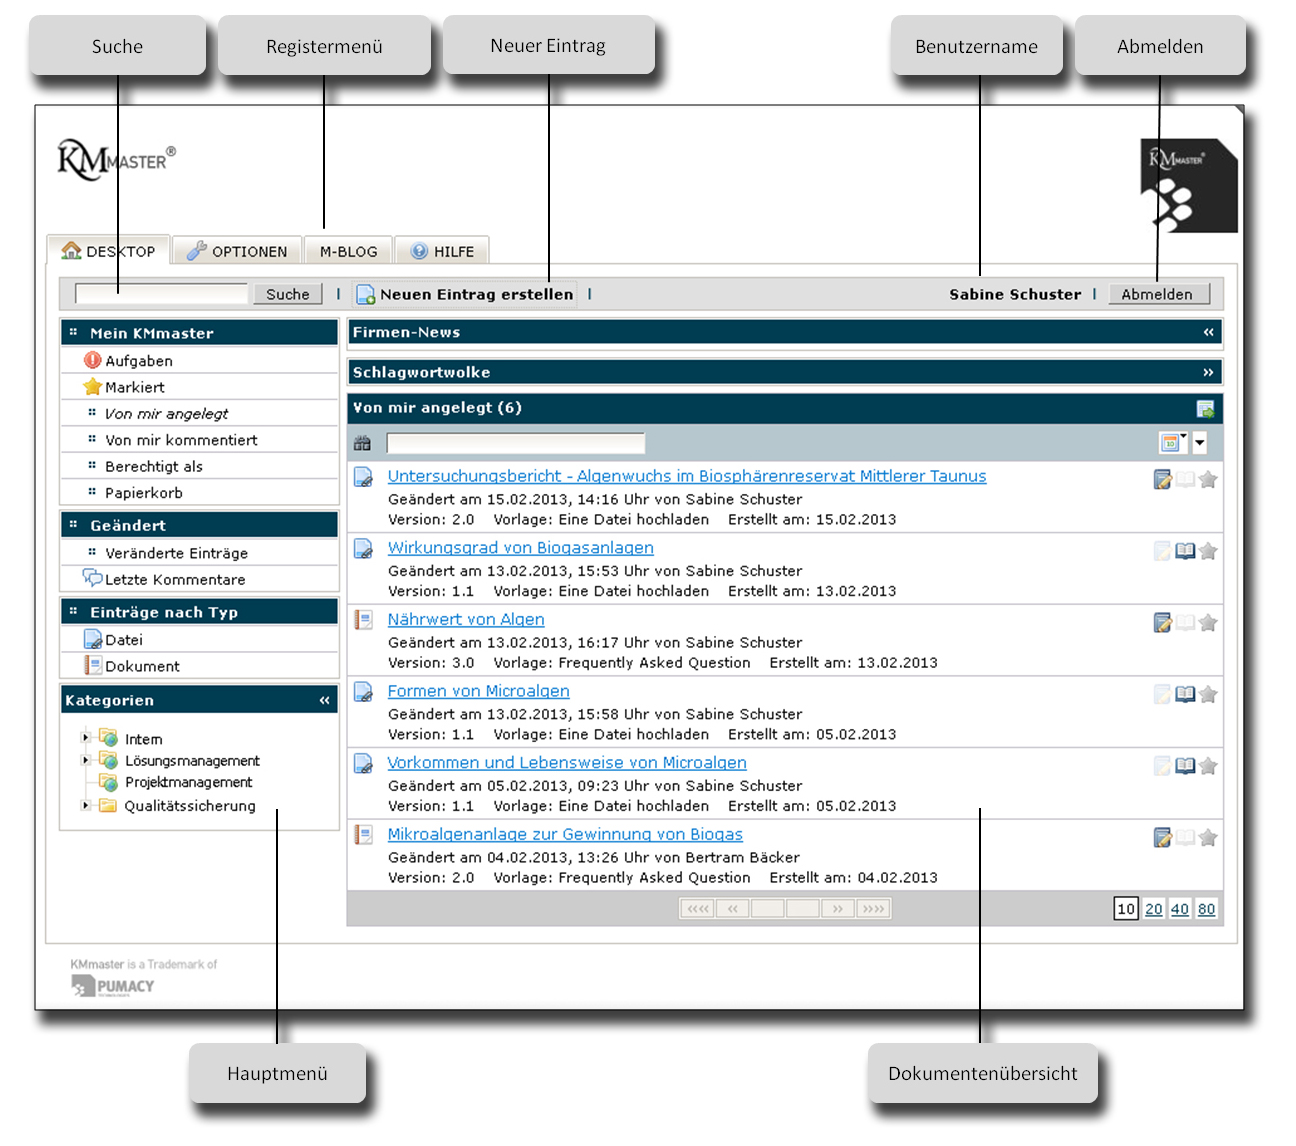 informationstechnologie knowledge management software